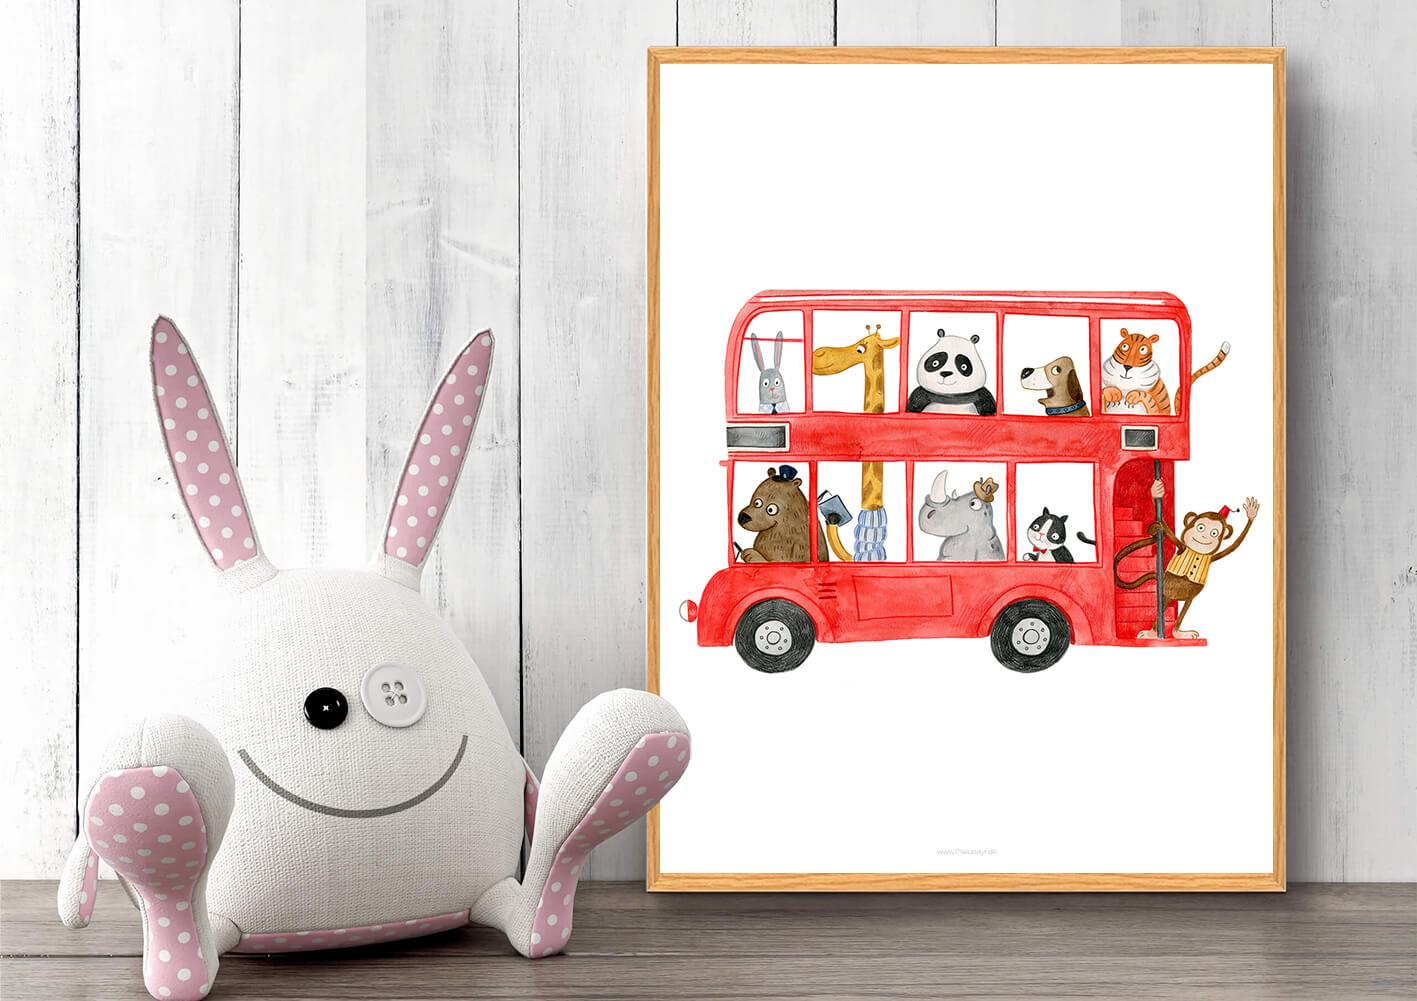 Busplakat-boernevaerelset-dyr-2